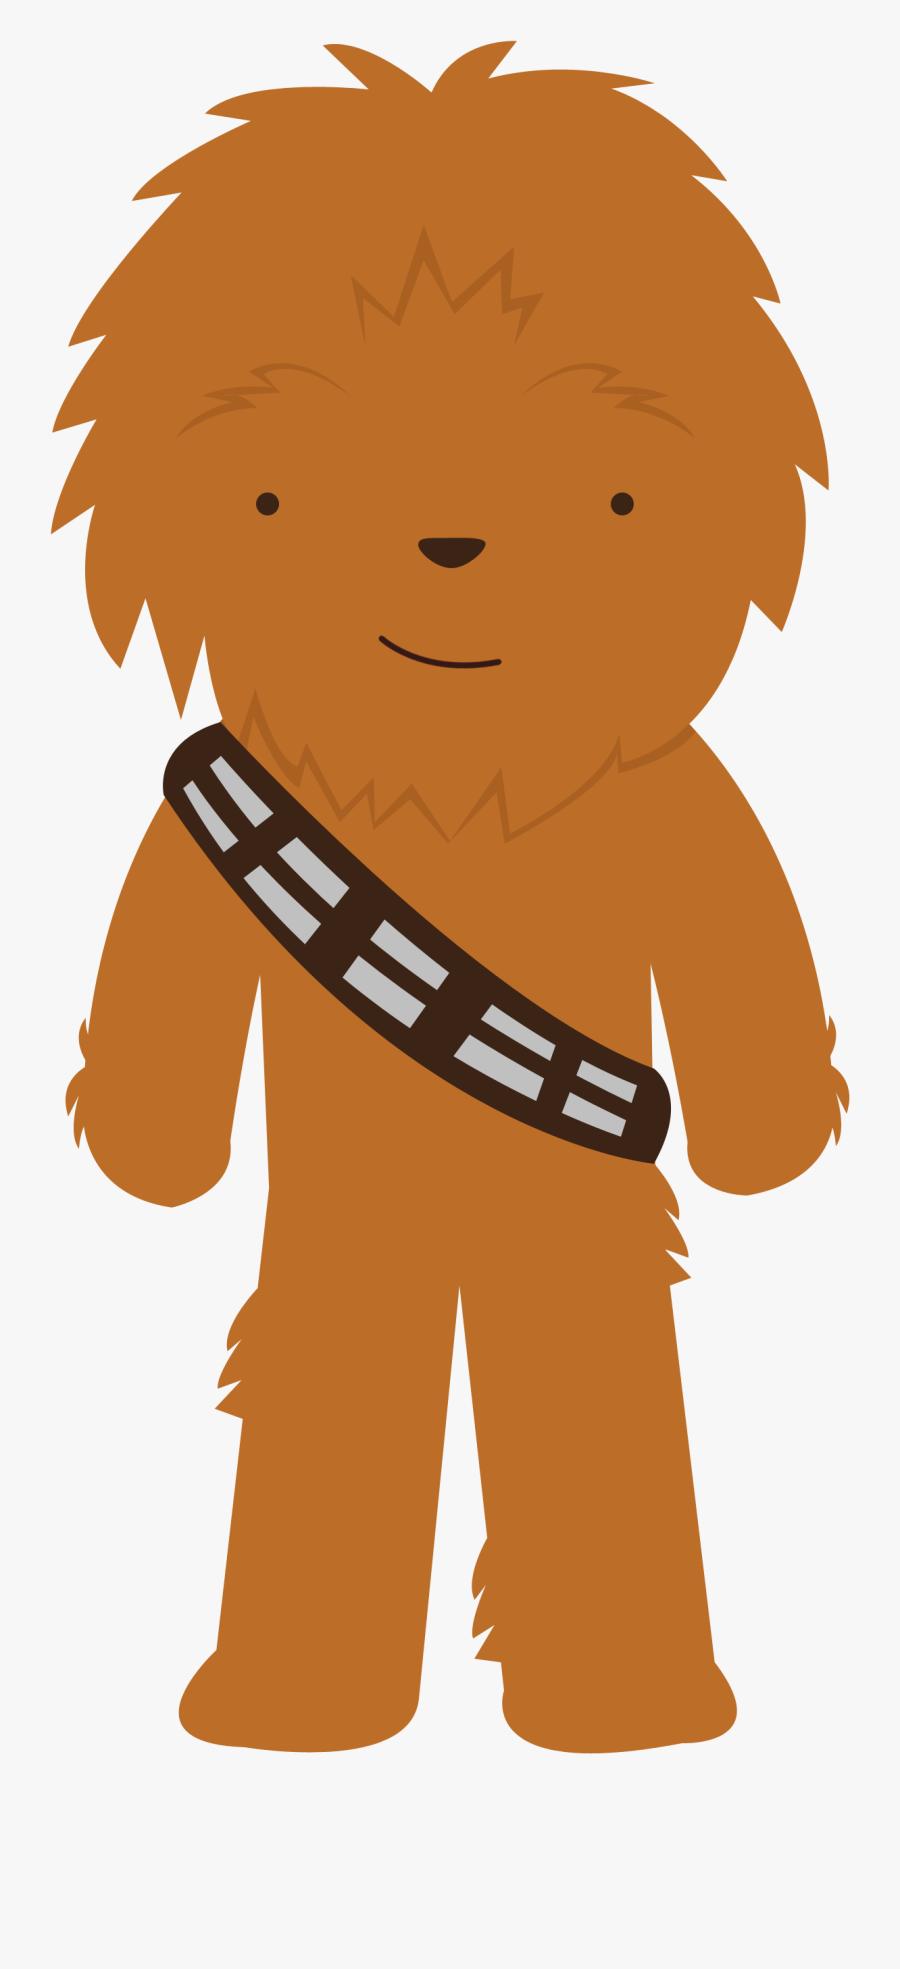 Star Wars - Star Wars Chewbacca Cute, Transparent Clipart